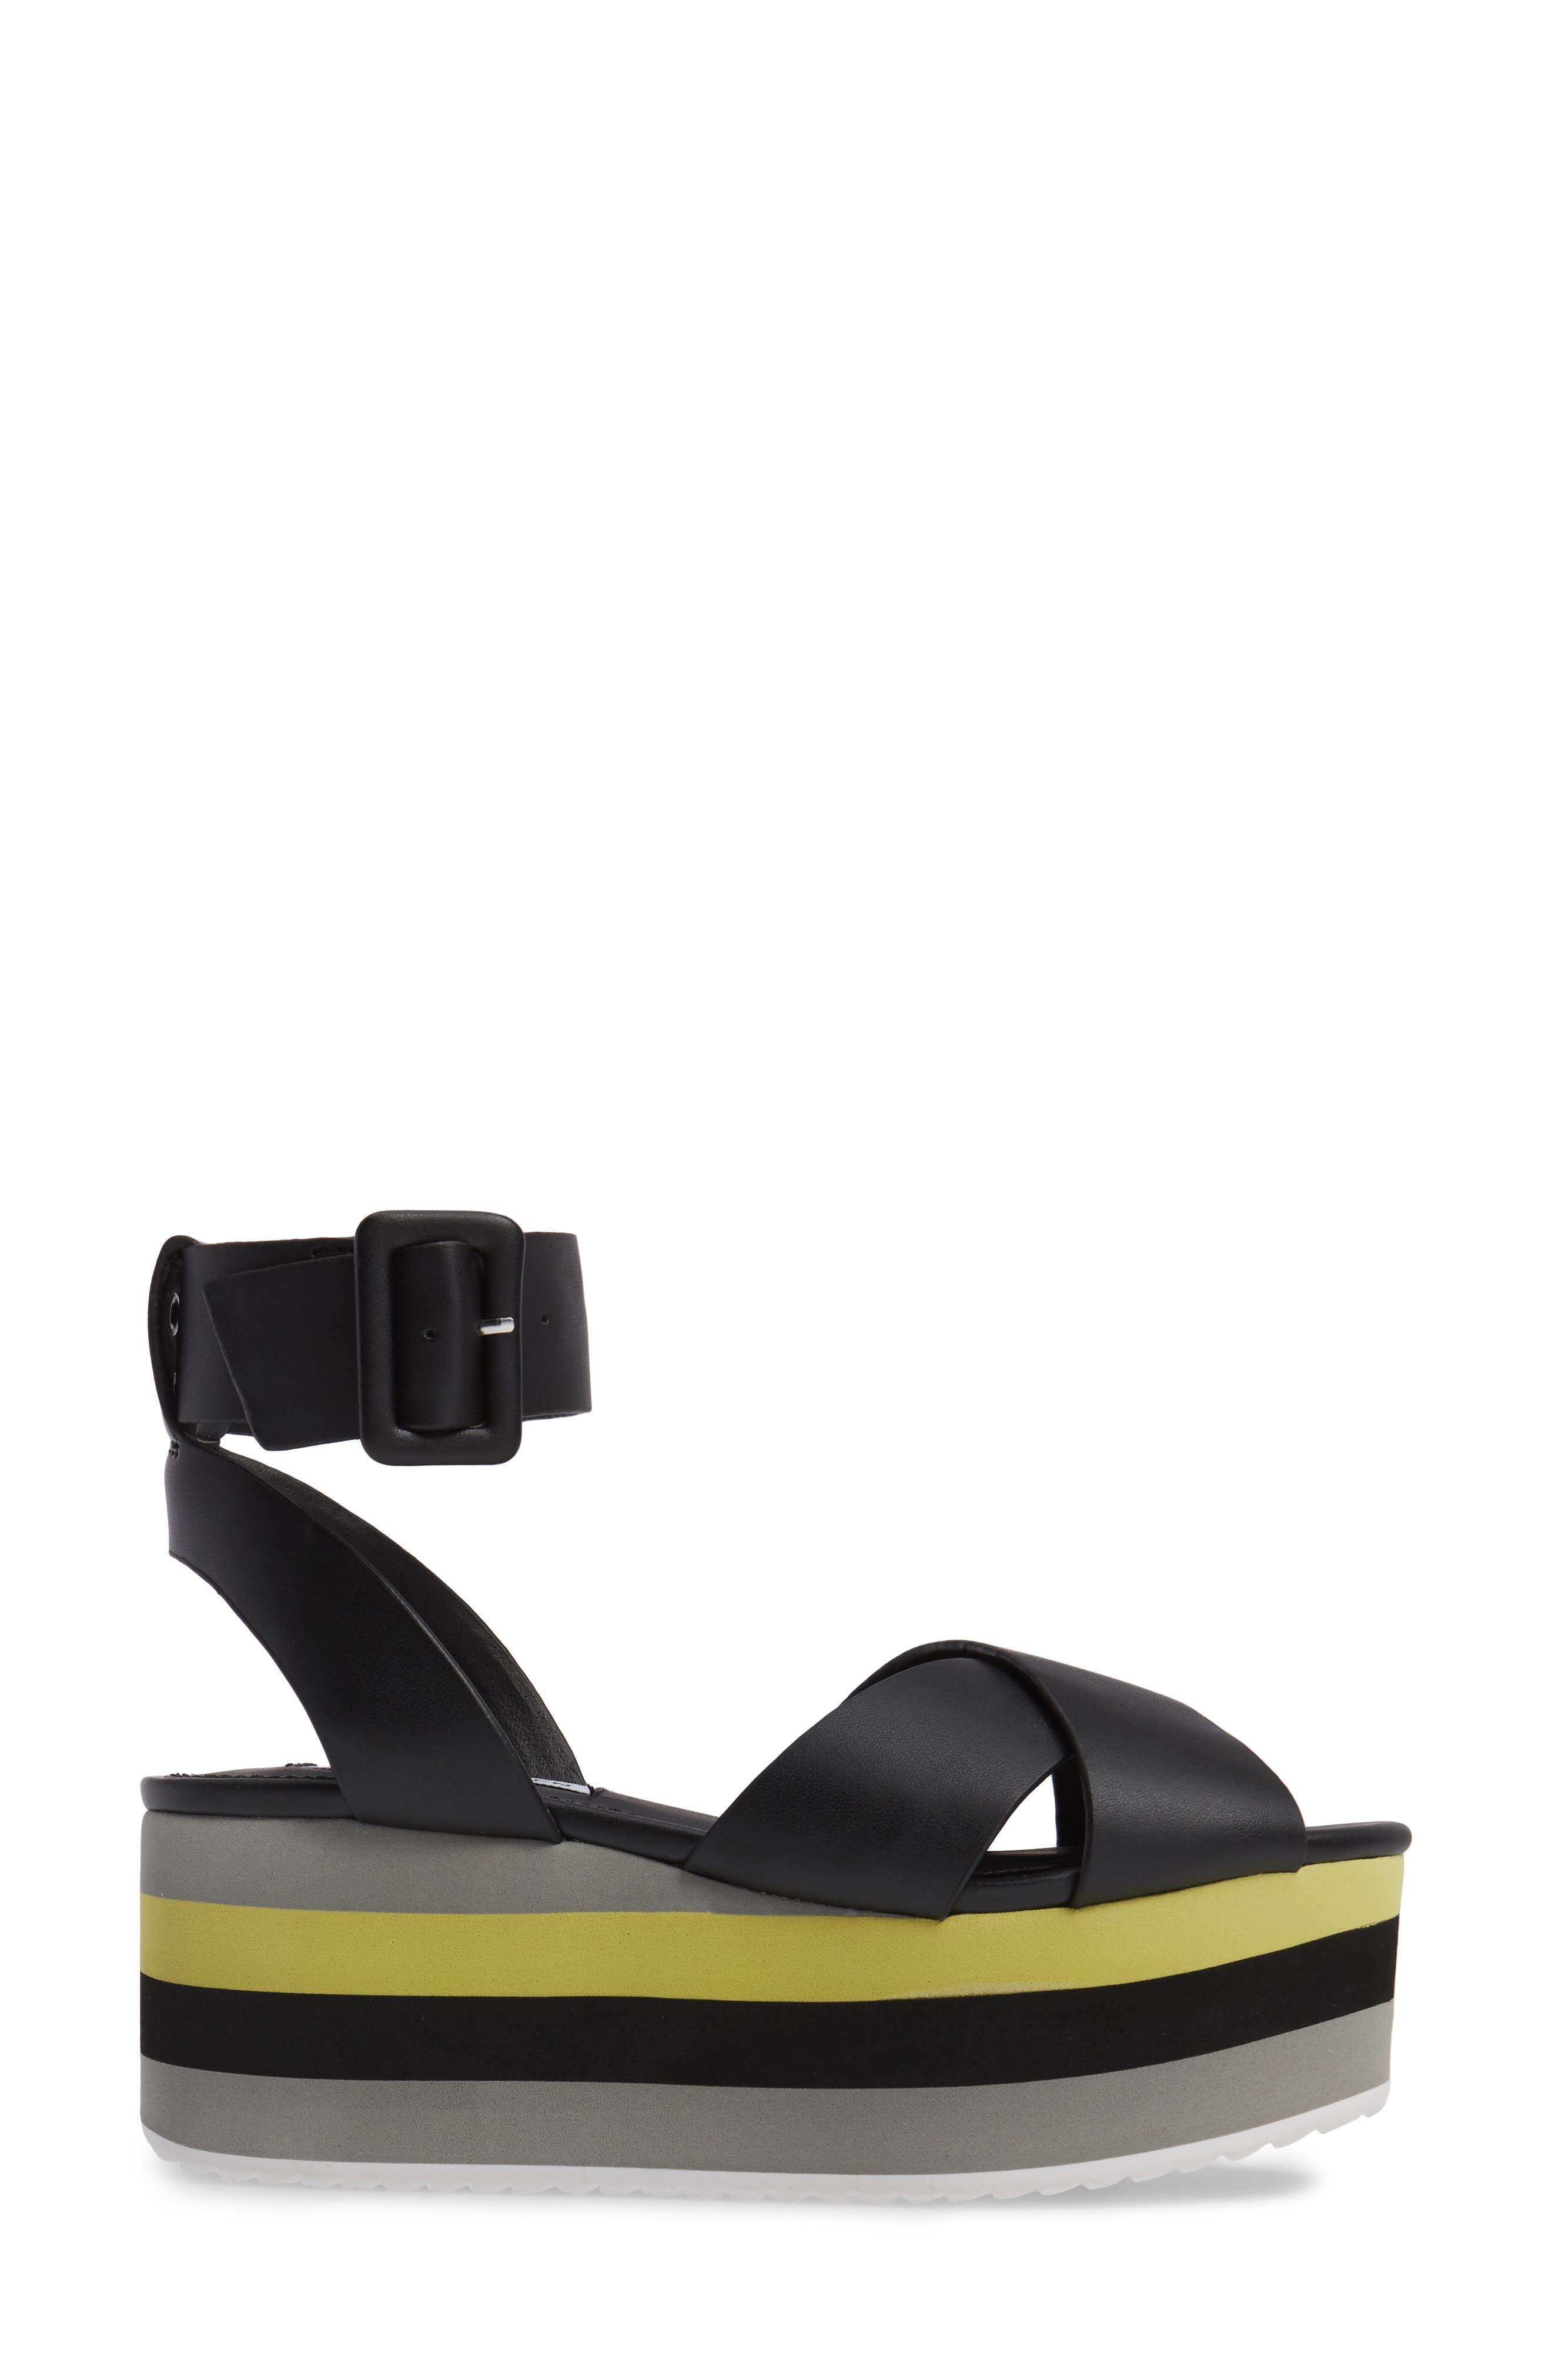 Macer Cuffed Platform Sandal,                             Alternate thumbnail 3, color,                             015